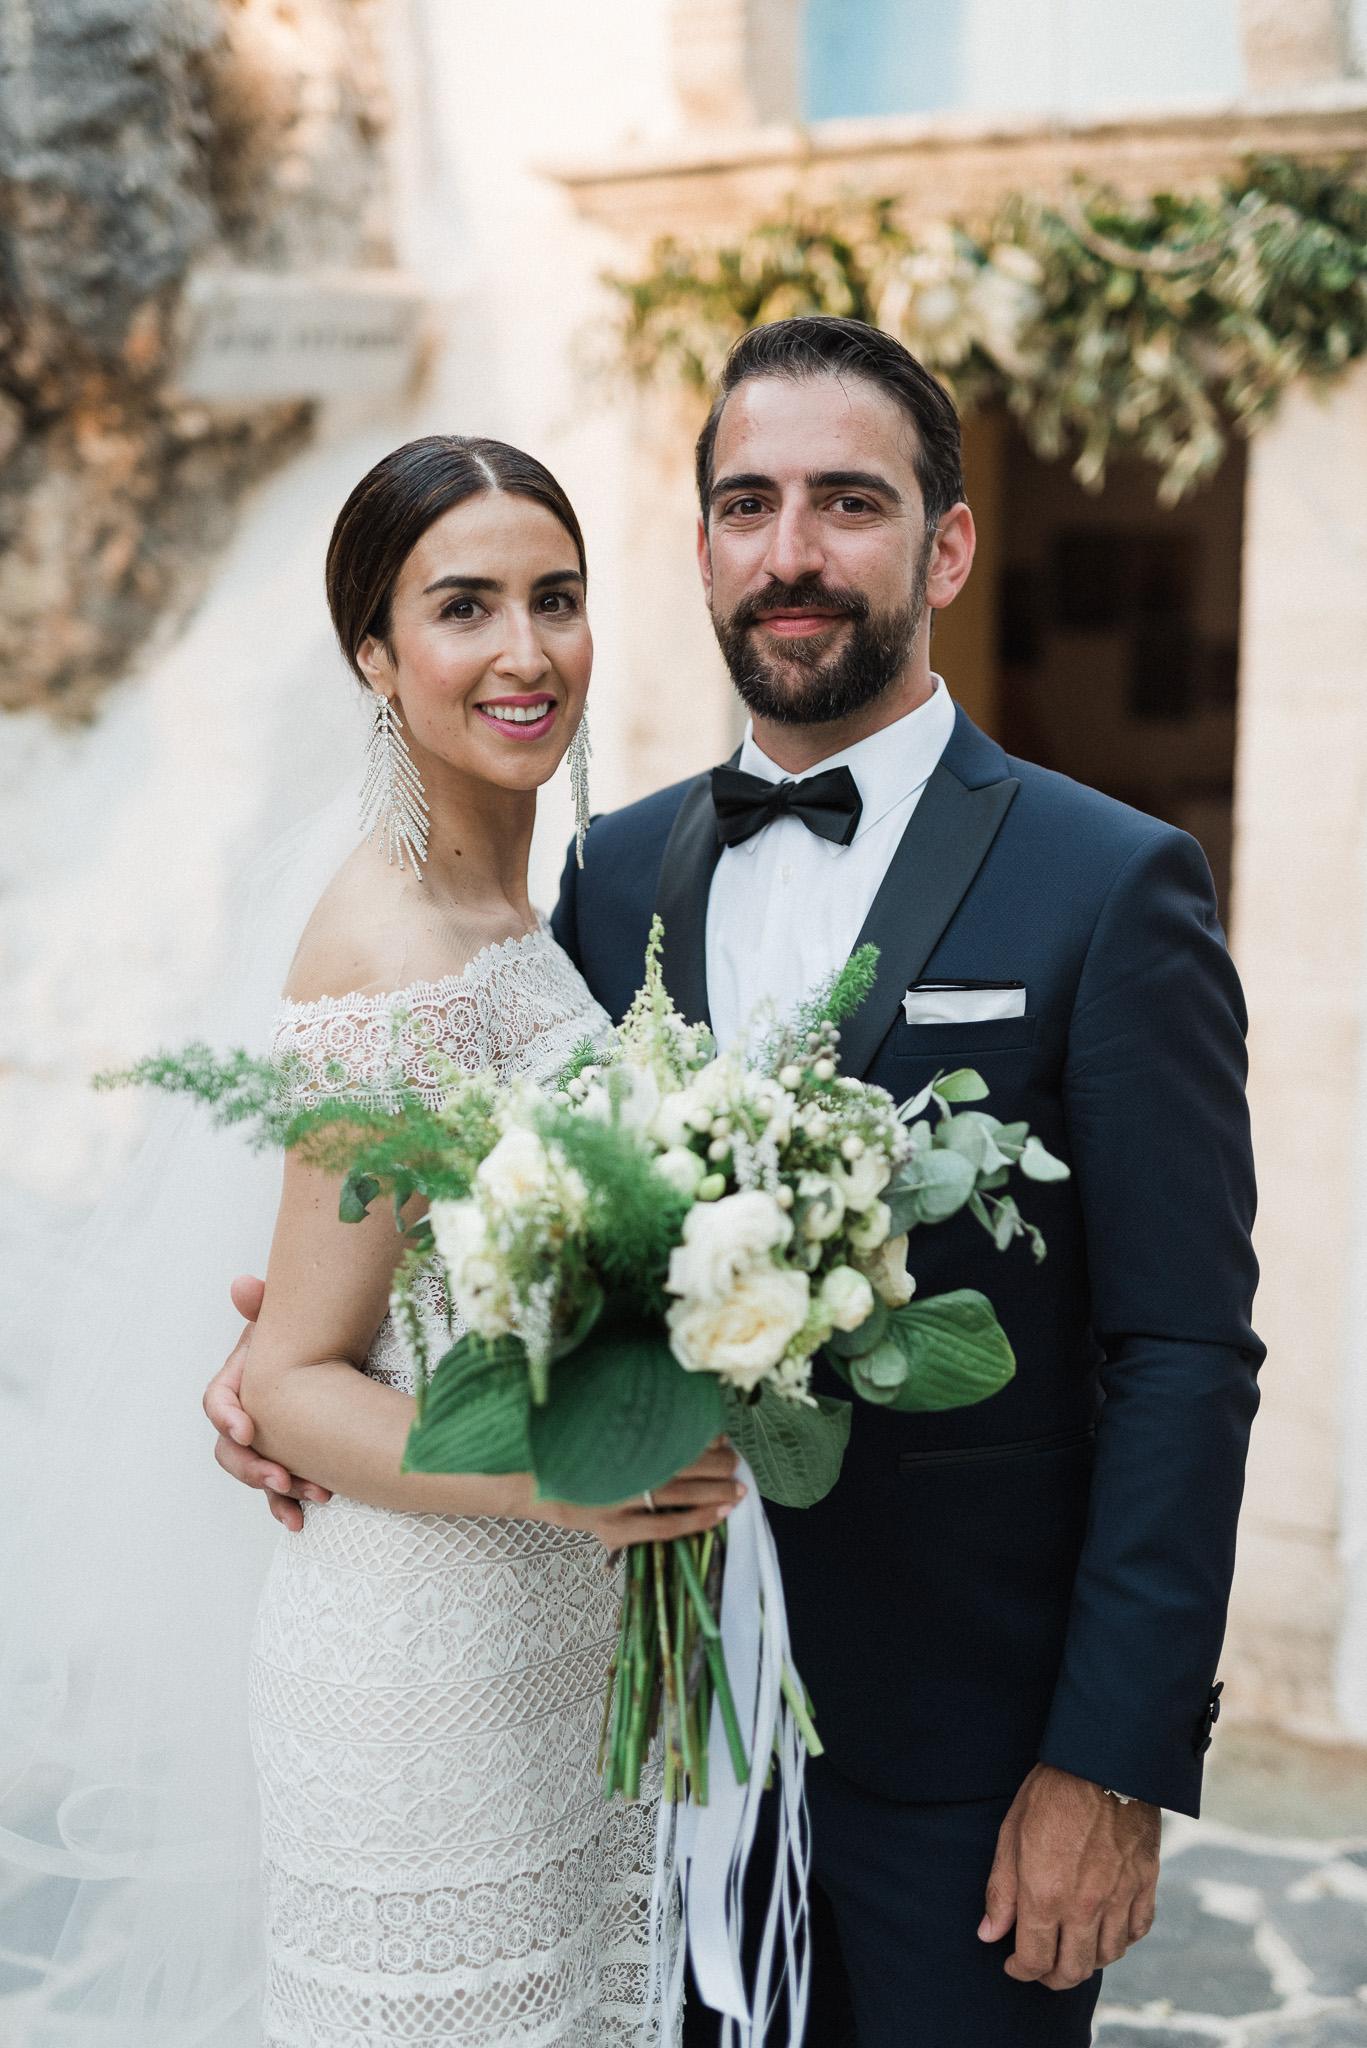 newlyweds at Greek Orthodox wedding ceremony in Crete